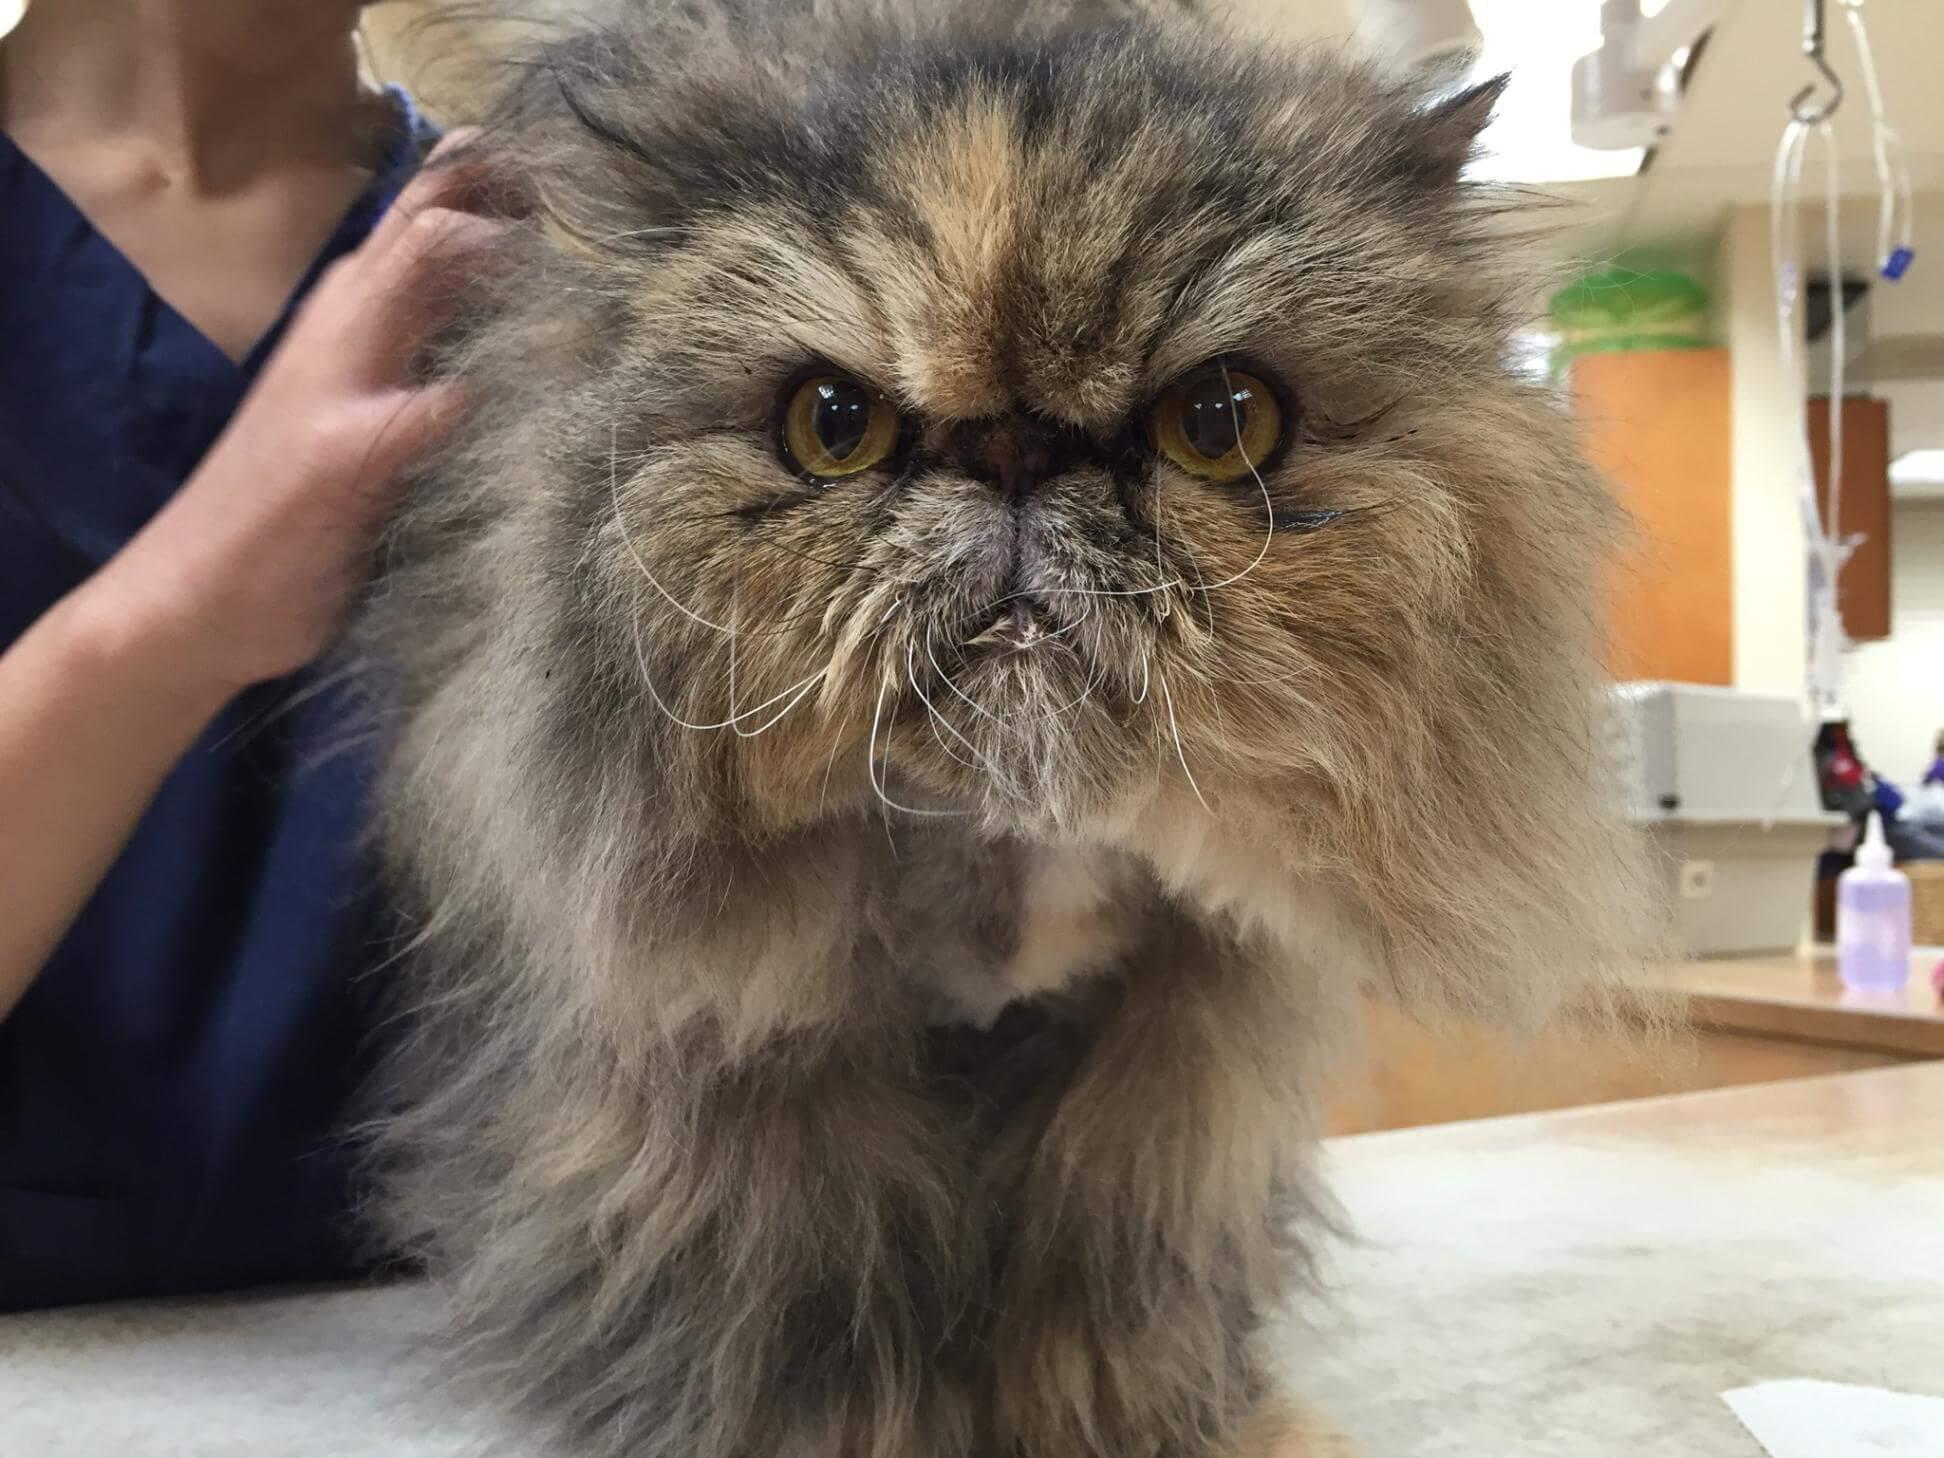 Sheeba the cat visits the vet